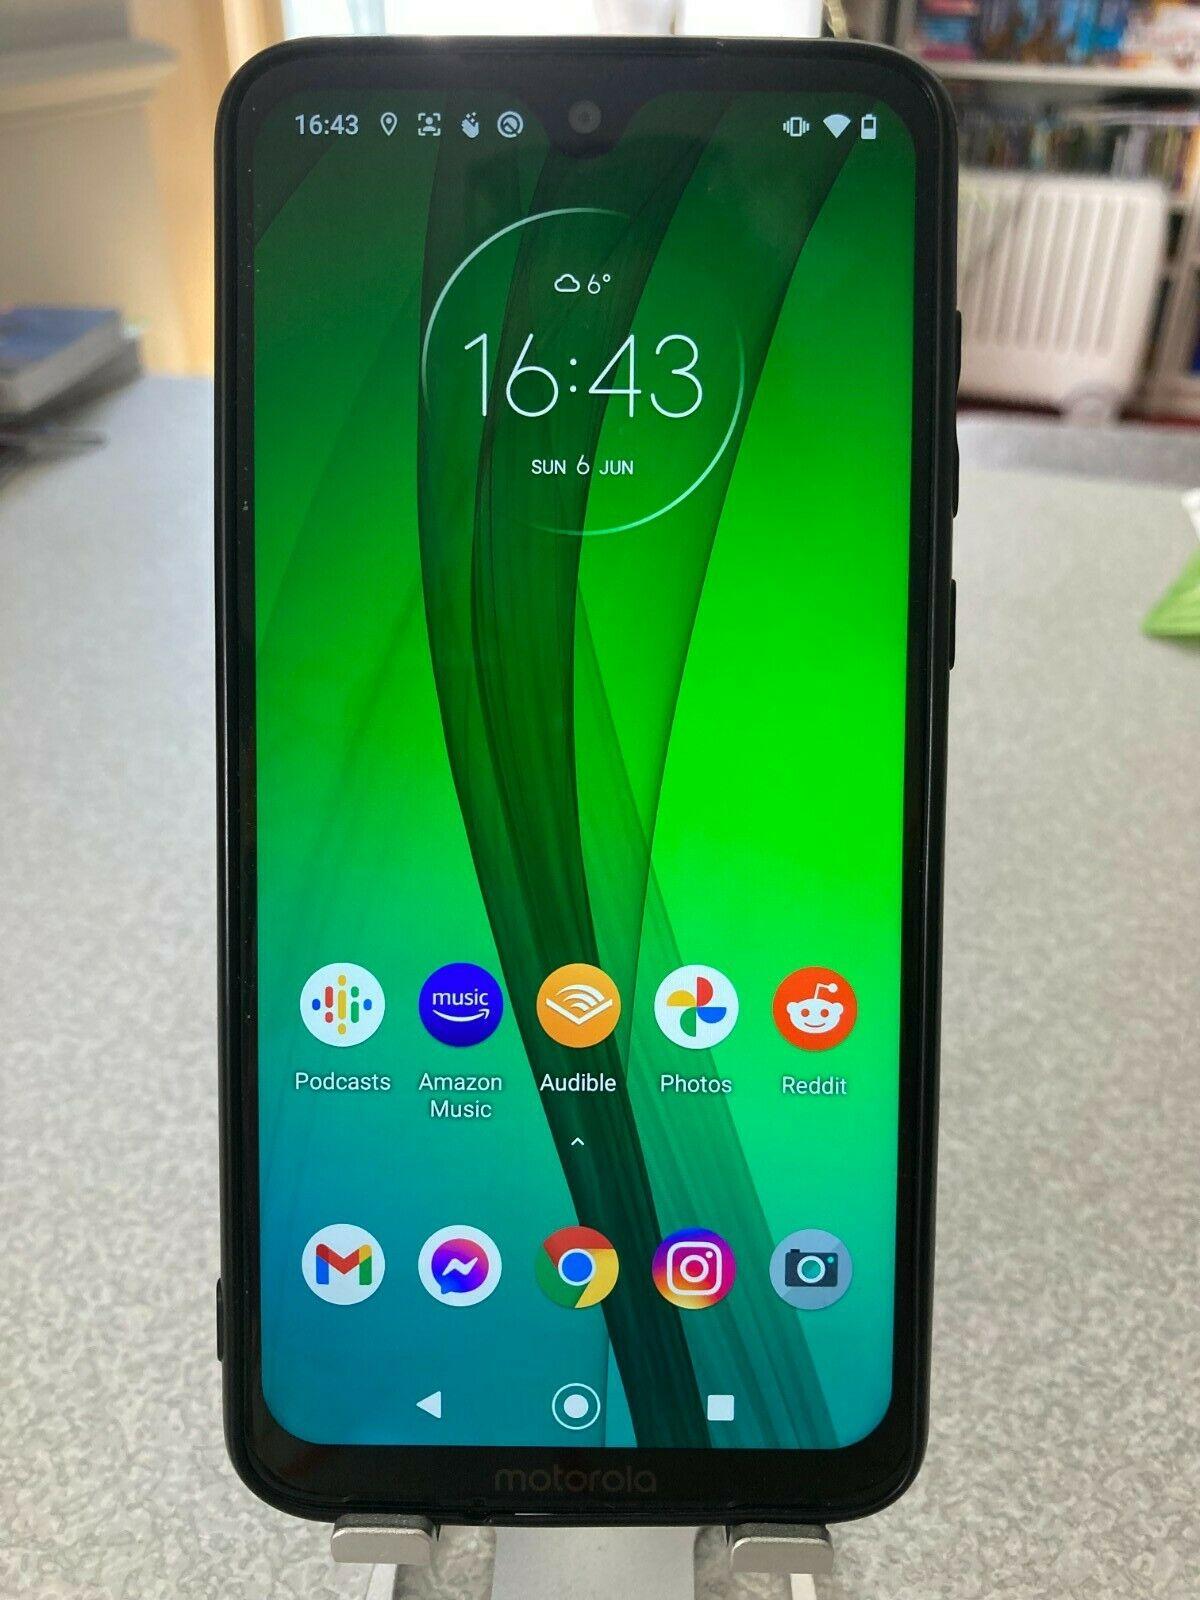 Android Phone - Motorola Moto G7 - 64GB - Ceramic Black (Unlocked) smartphone, mobile phone